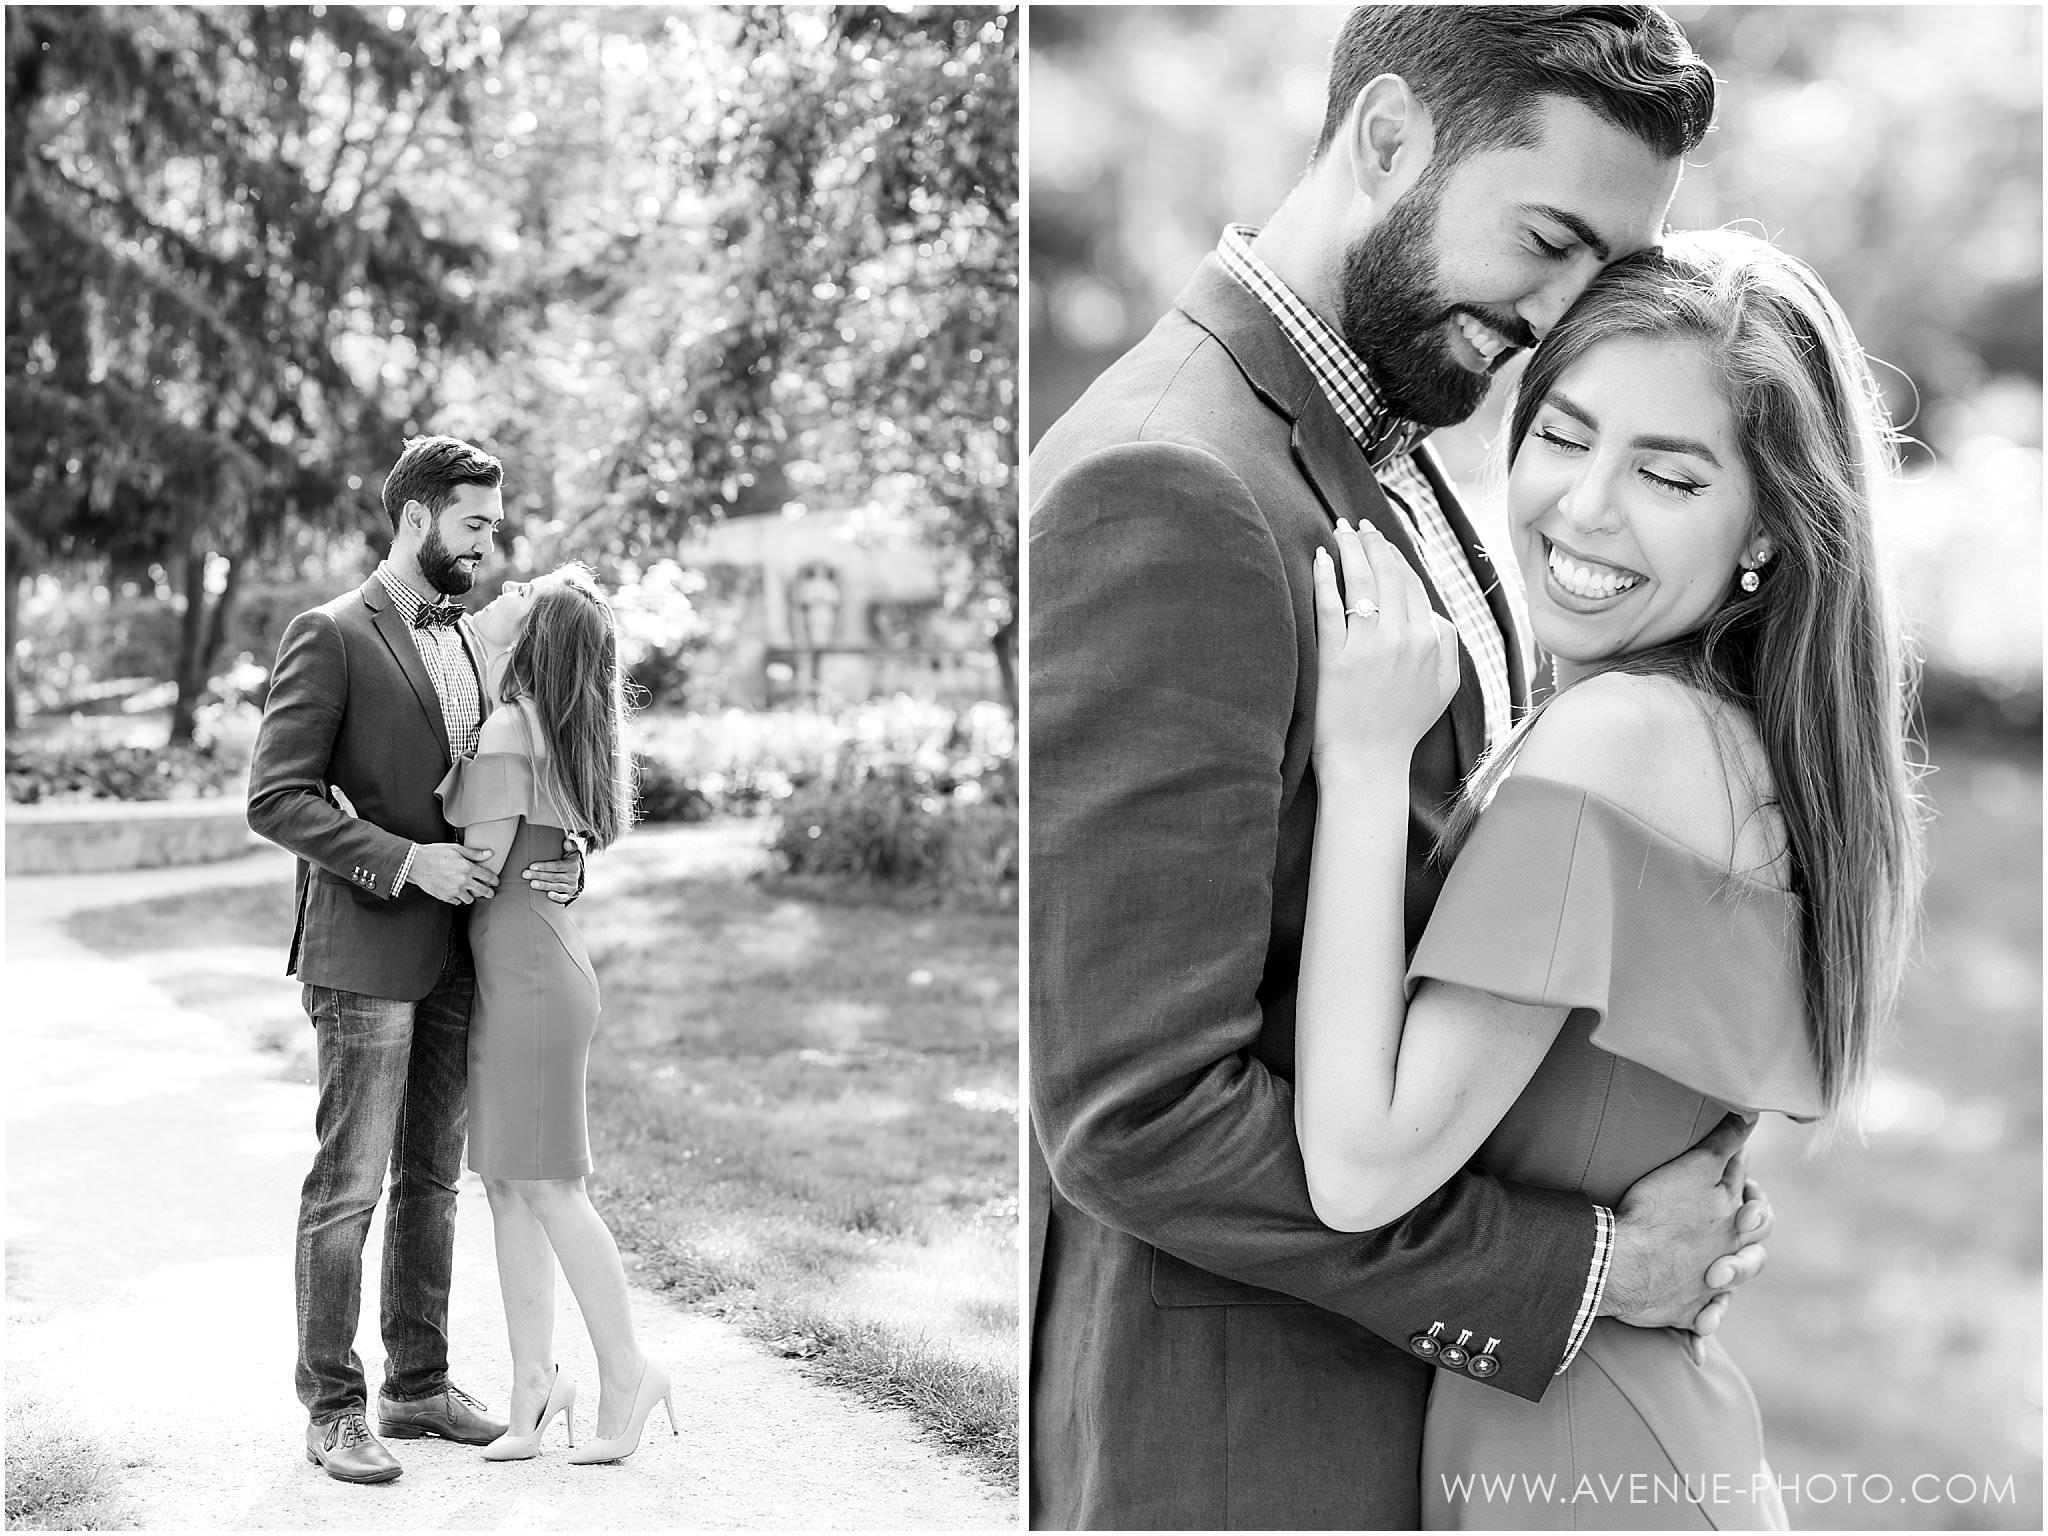 Scarborough Bluffs Engagement Photos, The Guild Inn Estate Engagement Photos, Toronto Wedding Photographer, Avenue Photo